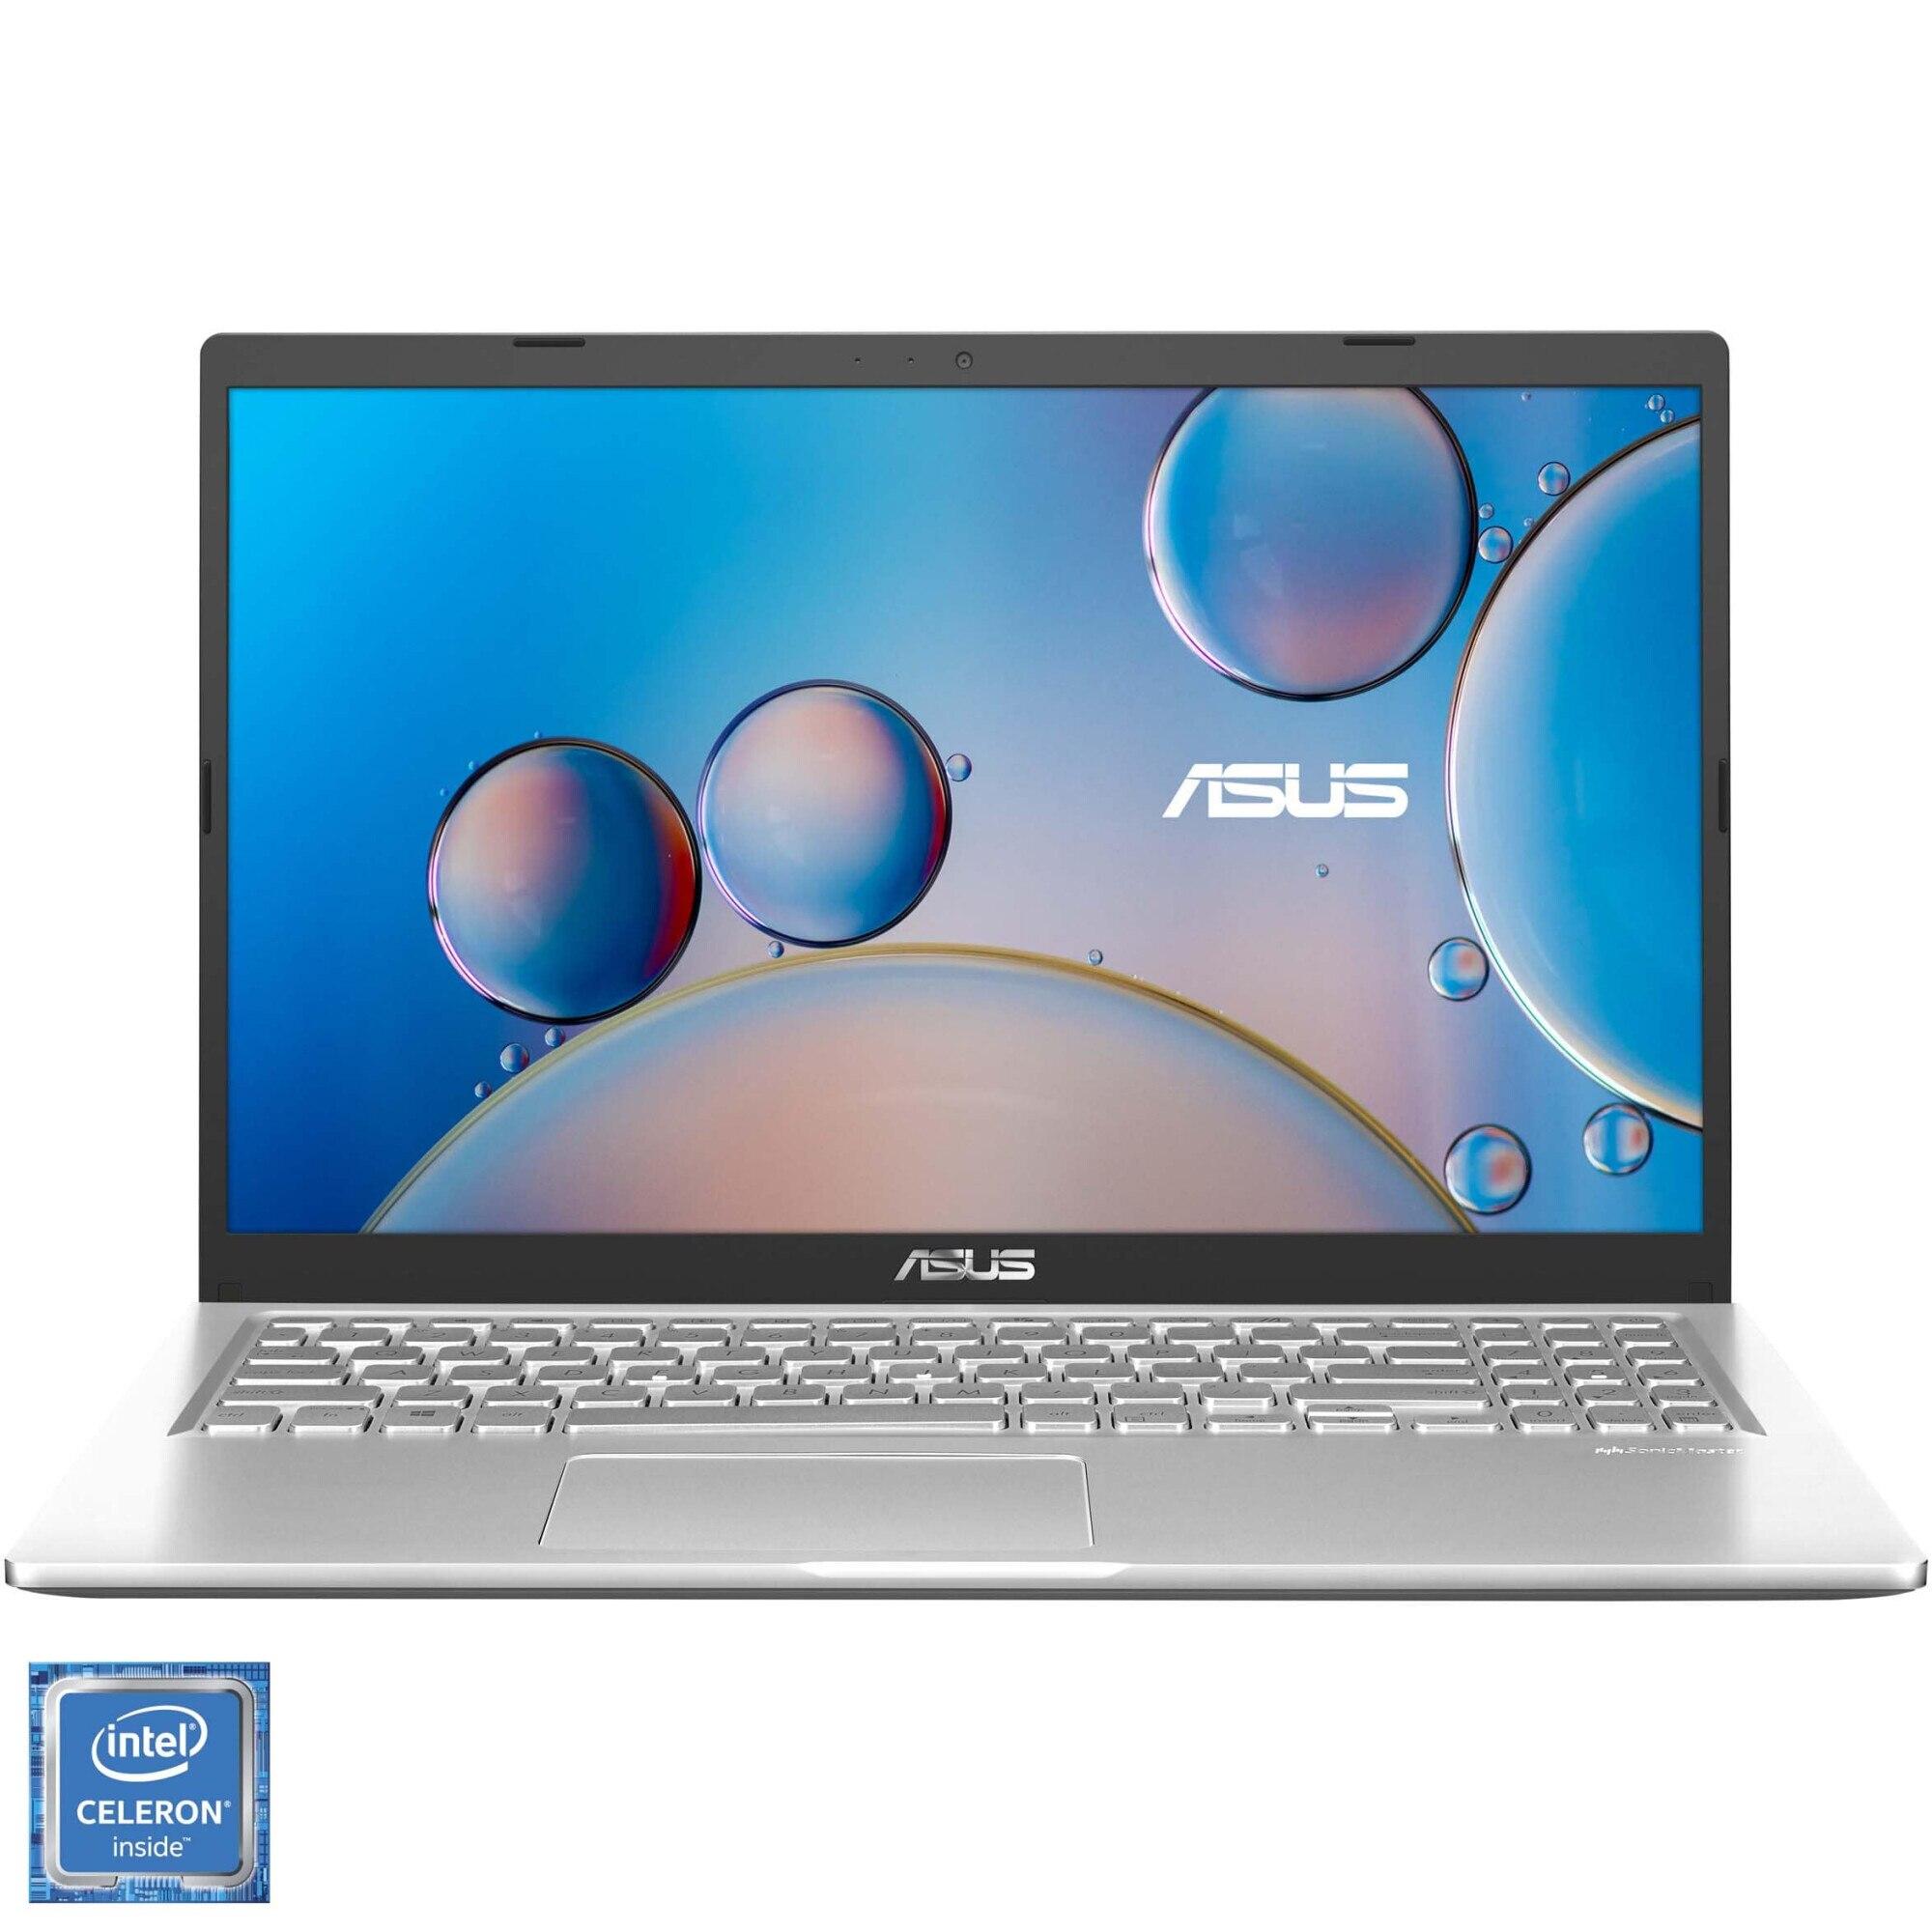 "Fotografie Laptop ASUS X515MA cu procesor Intel® Celeron® N4020 pana la 2.80 GHz, 15.6"", HD, 4GB, 1TB HDD, Intel® UHD Graphics 600, Free DOS, Transparent Silver"